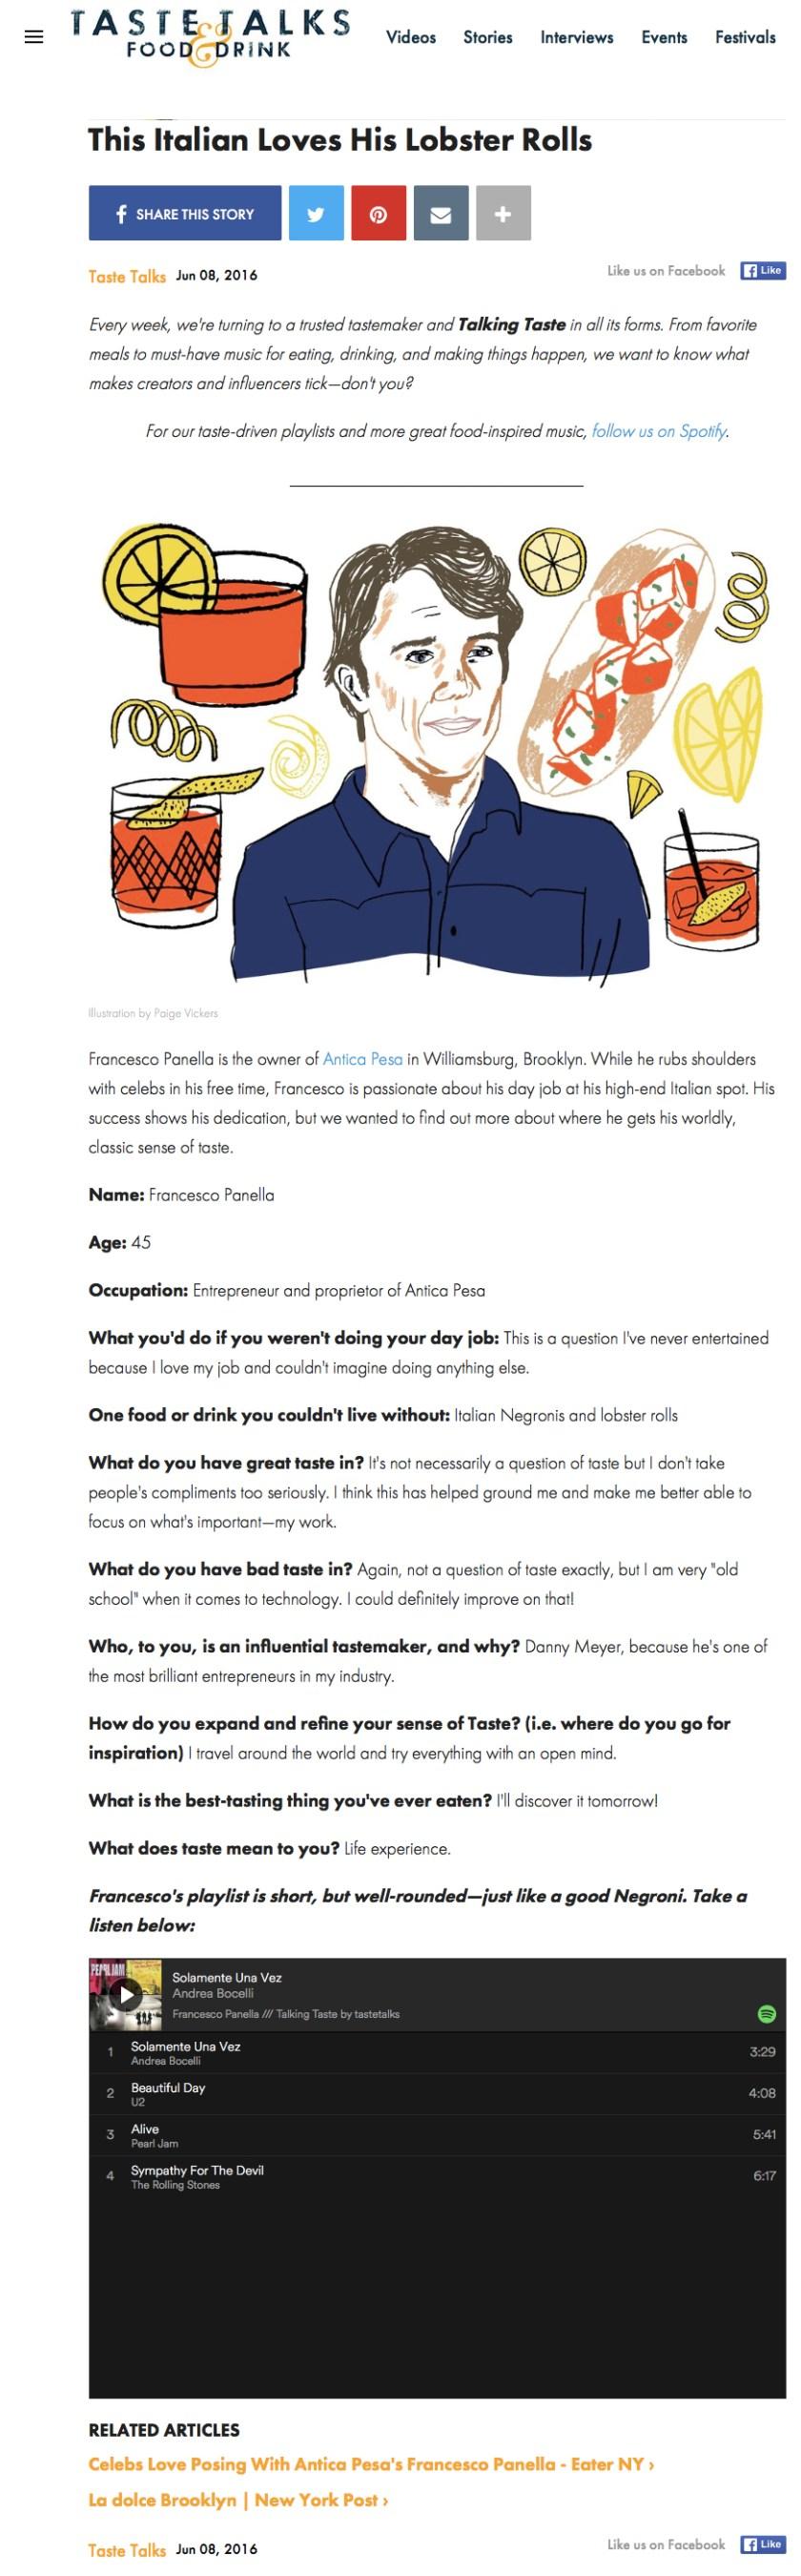 TasteTalks.com - 6.8.16 - Francesco Panella.jpg